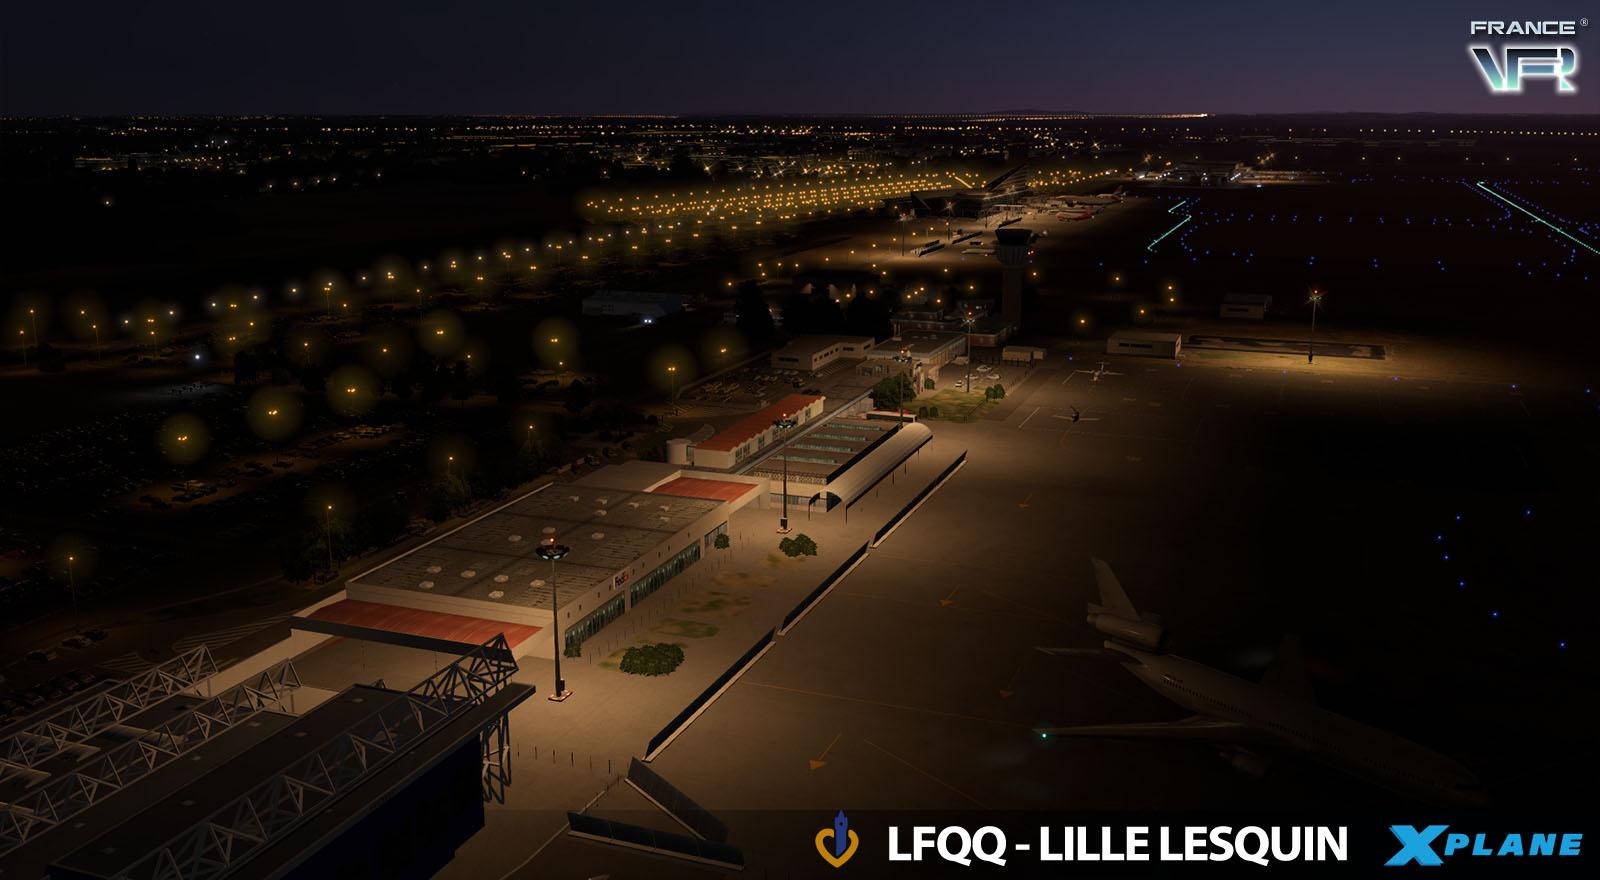 LFQQXP_33